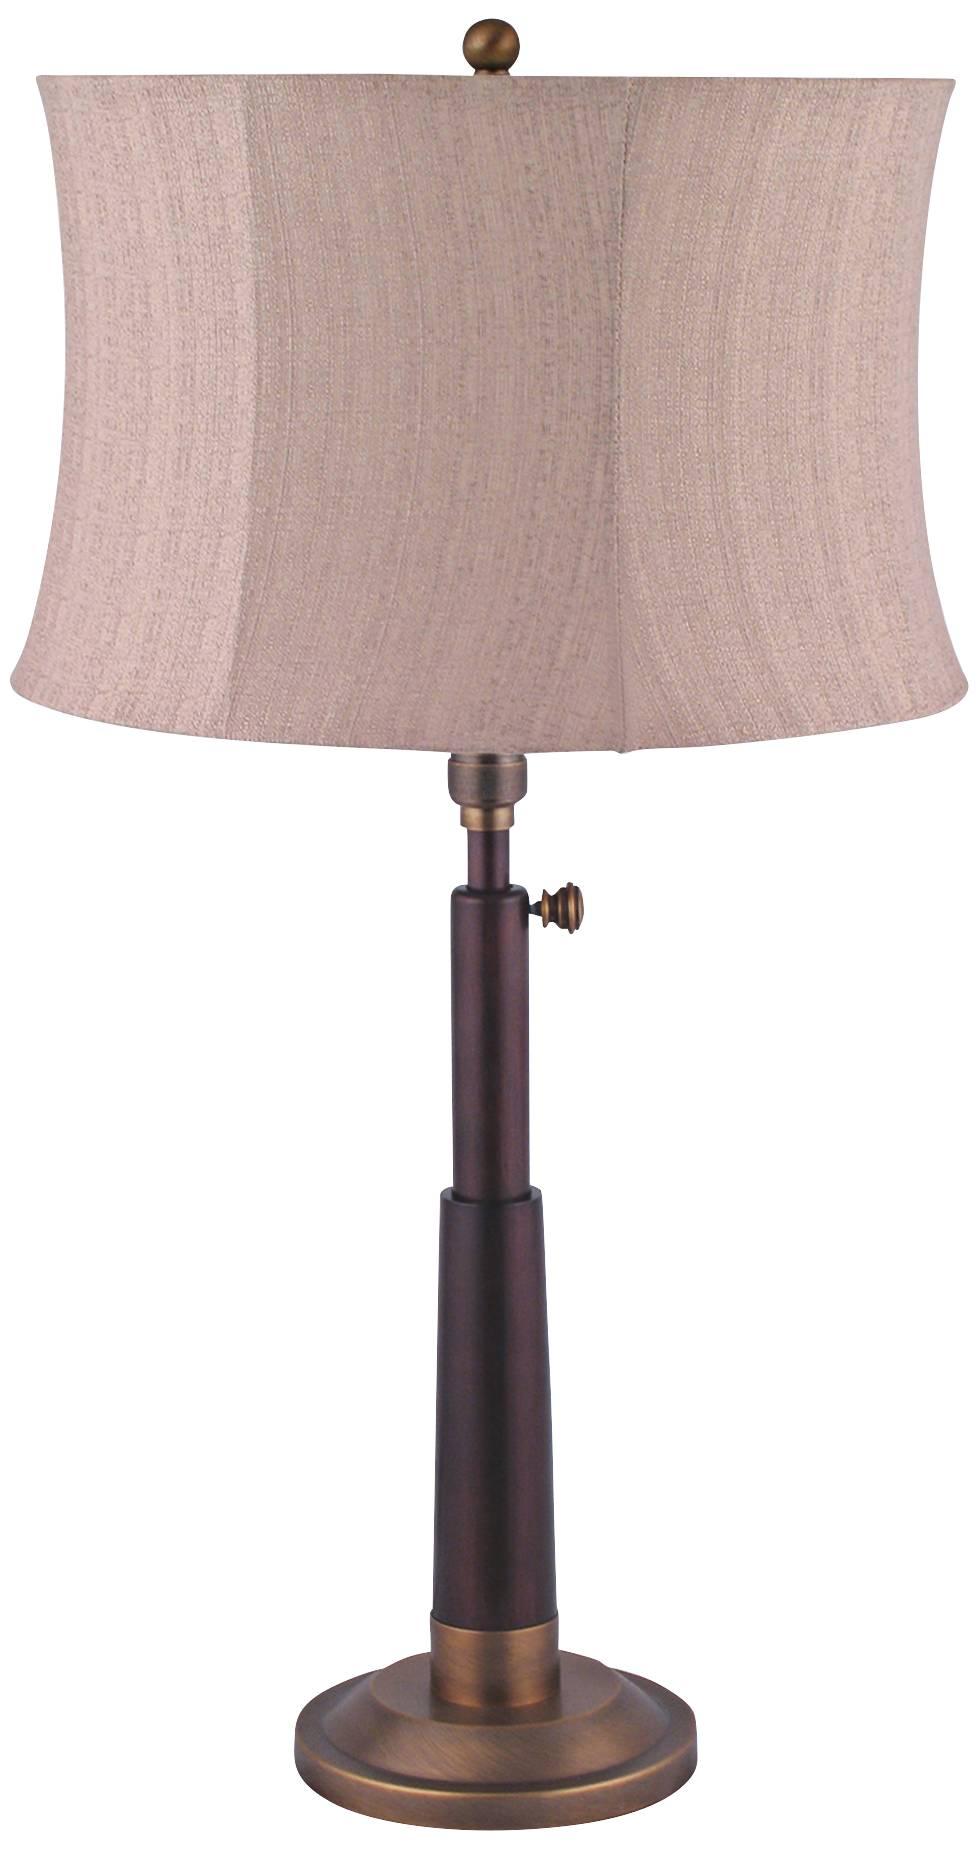 Ansel antique brass adjustable telescope table lamp